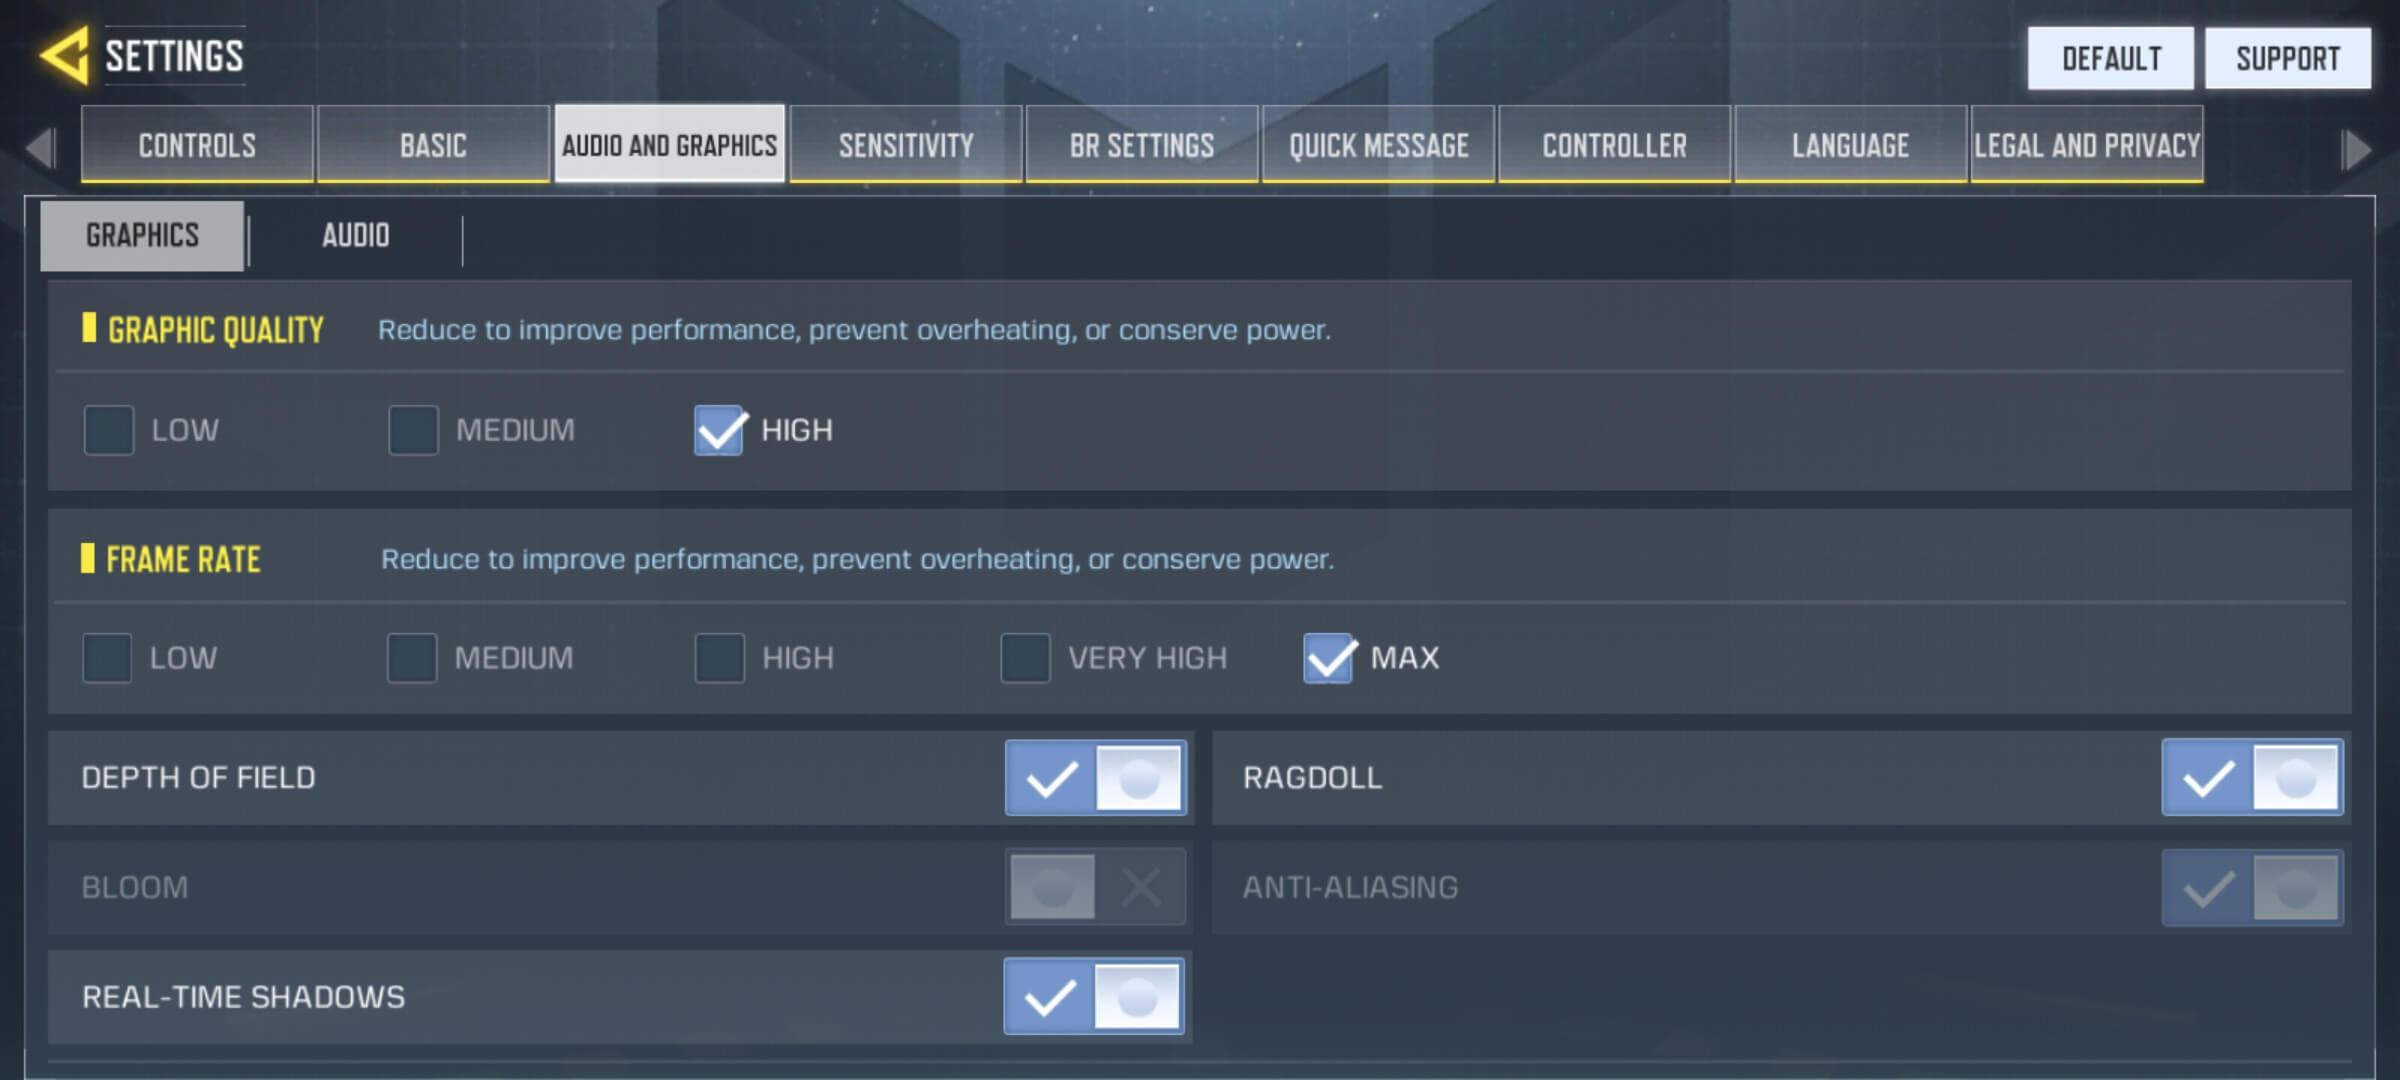 Screenshot 20200619 154935 com.activision.callofduty.shooter